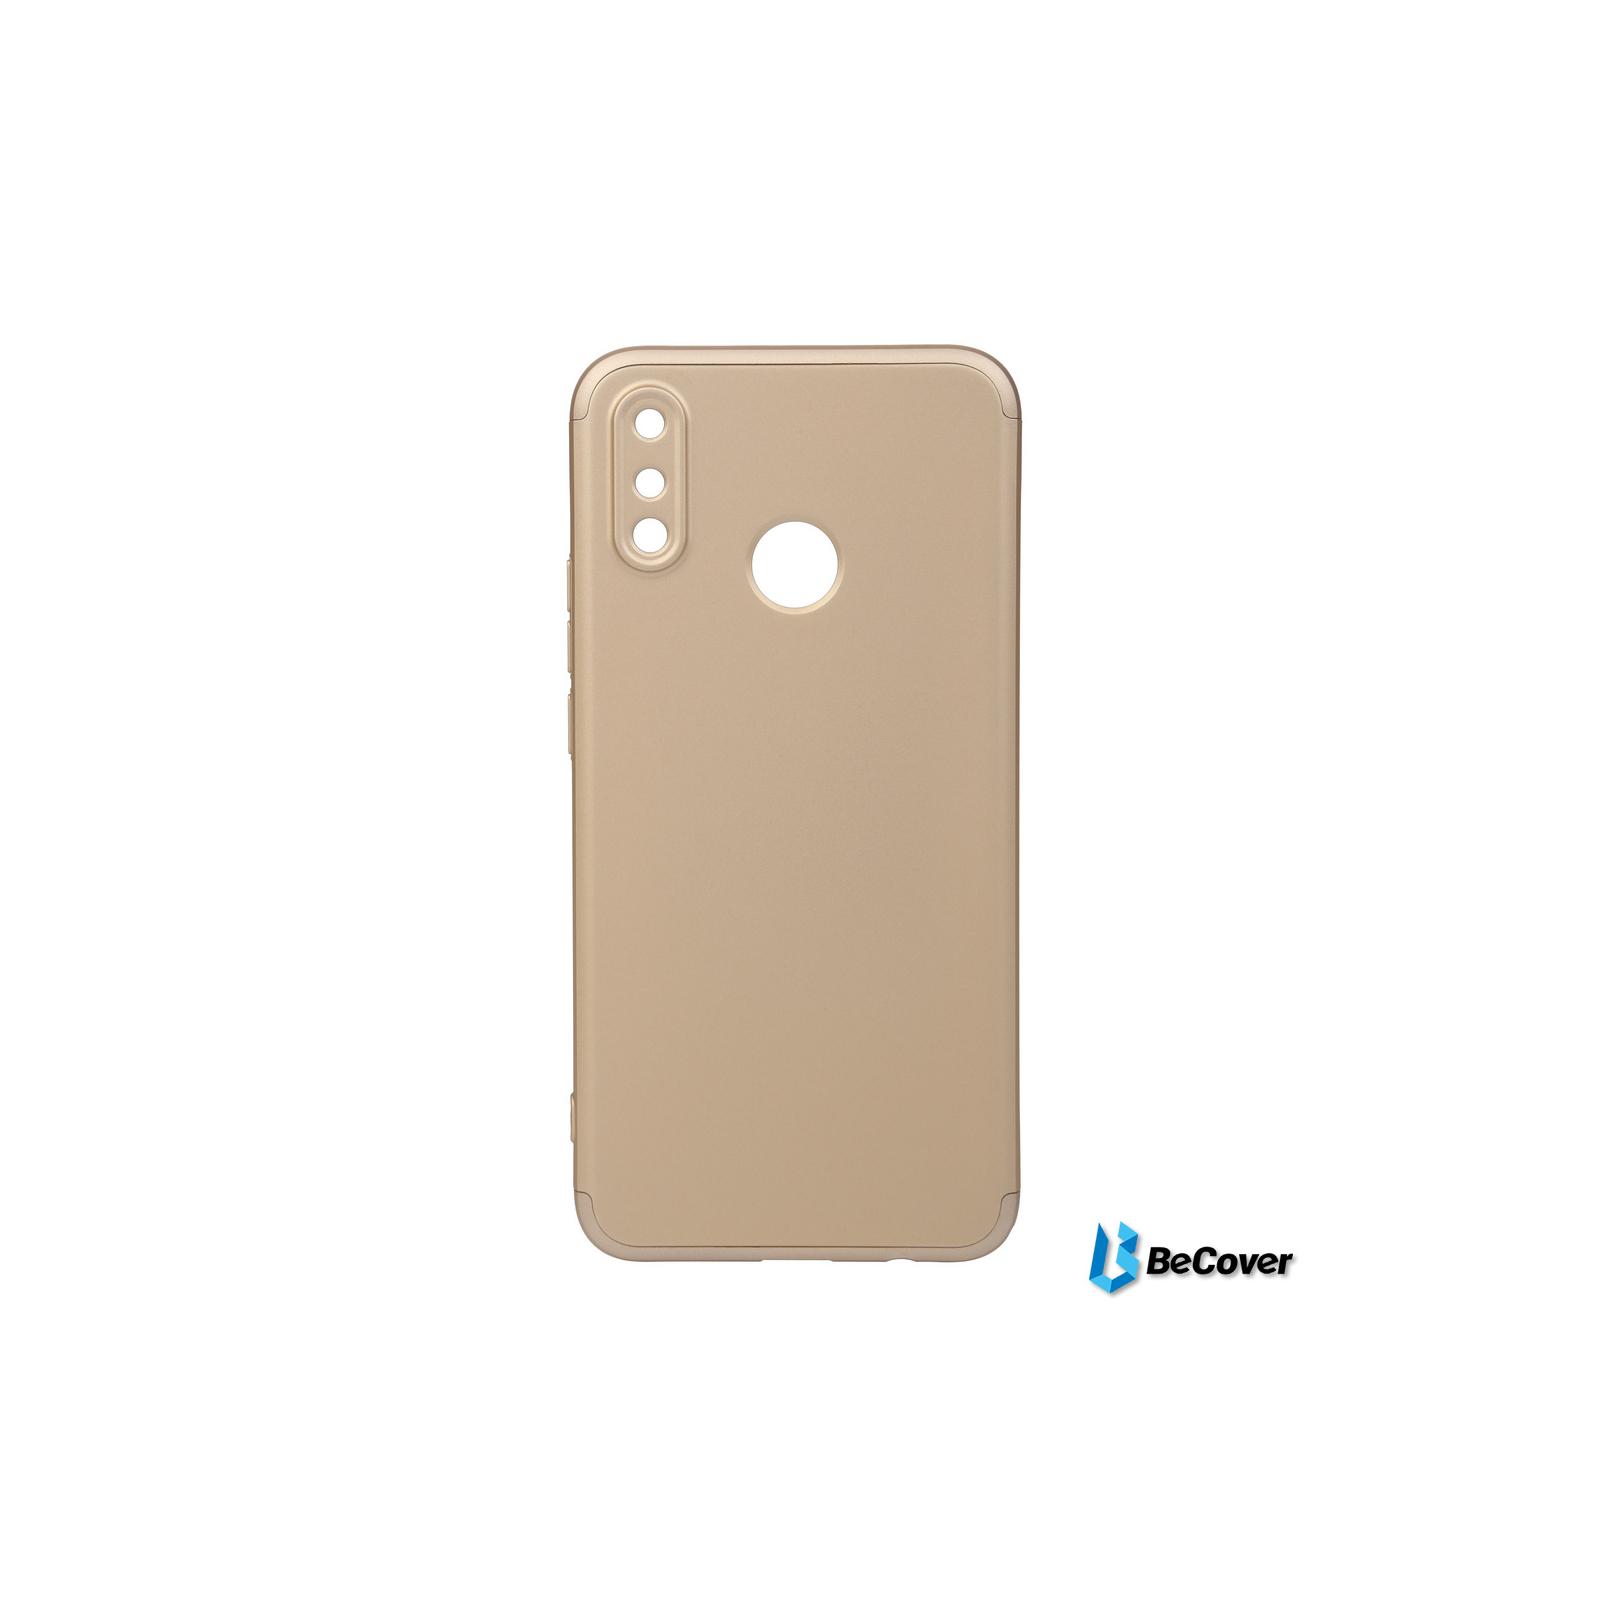 Чехол для моб. телефона BeCover Huawei P Smart+ Gold (702635)